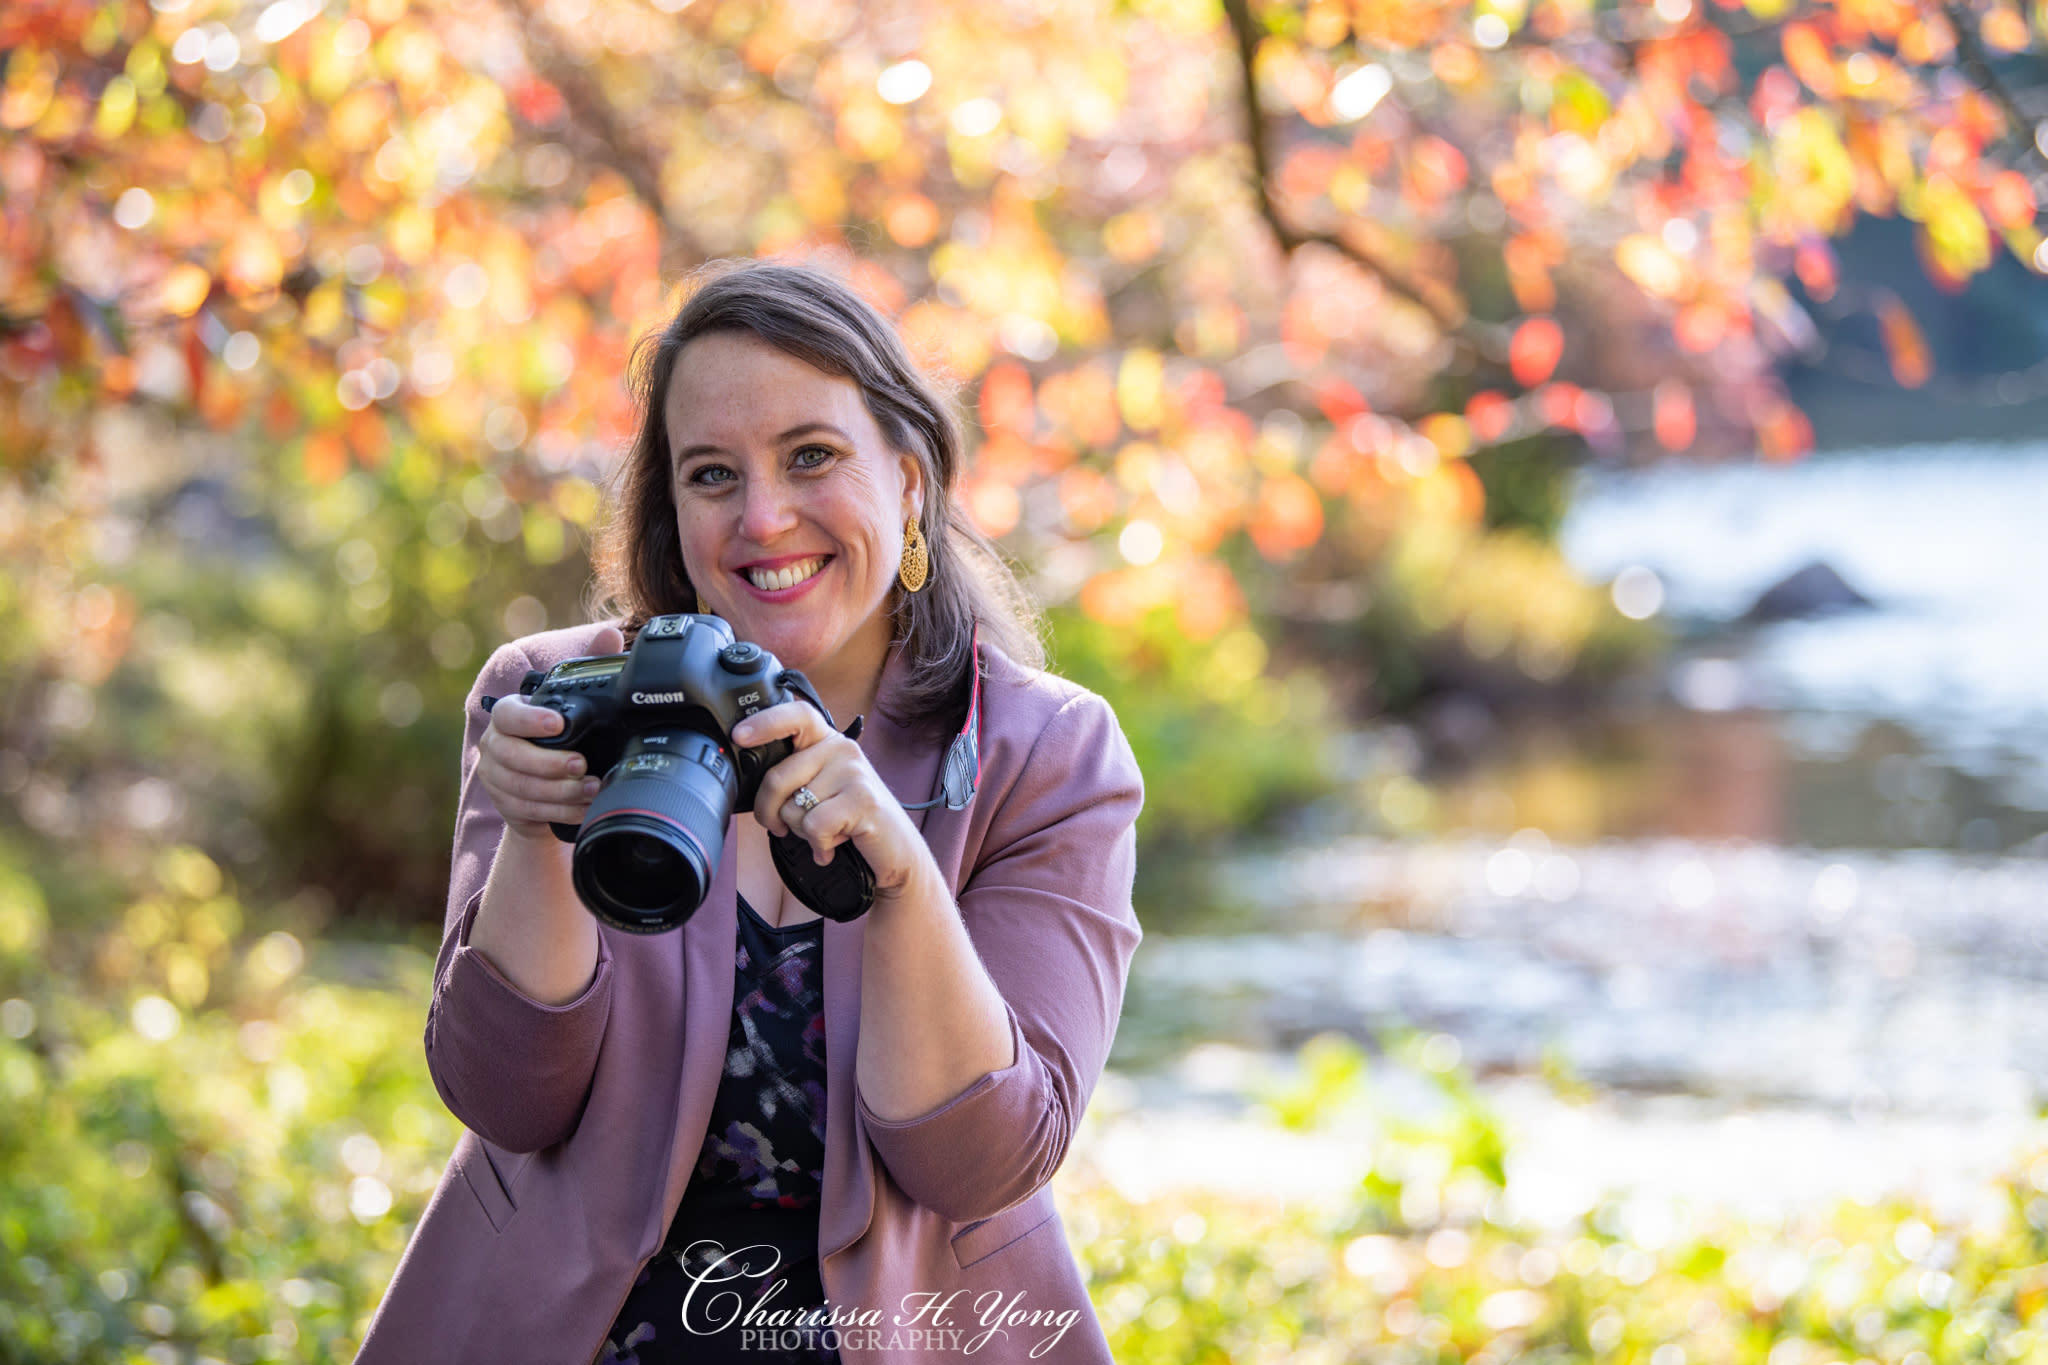 A woman holding a DSLR camera at a park during Fall season.